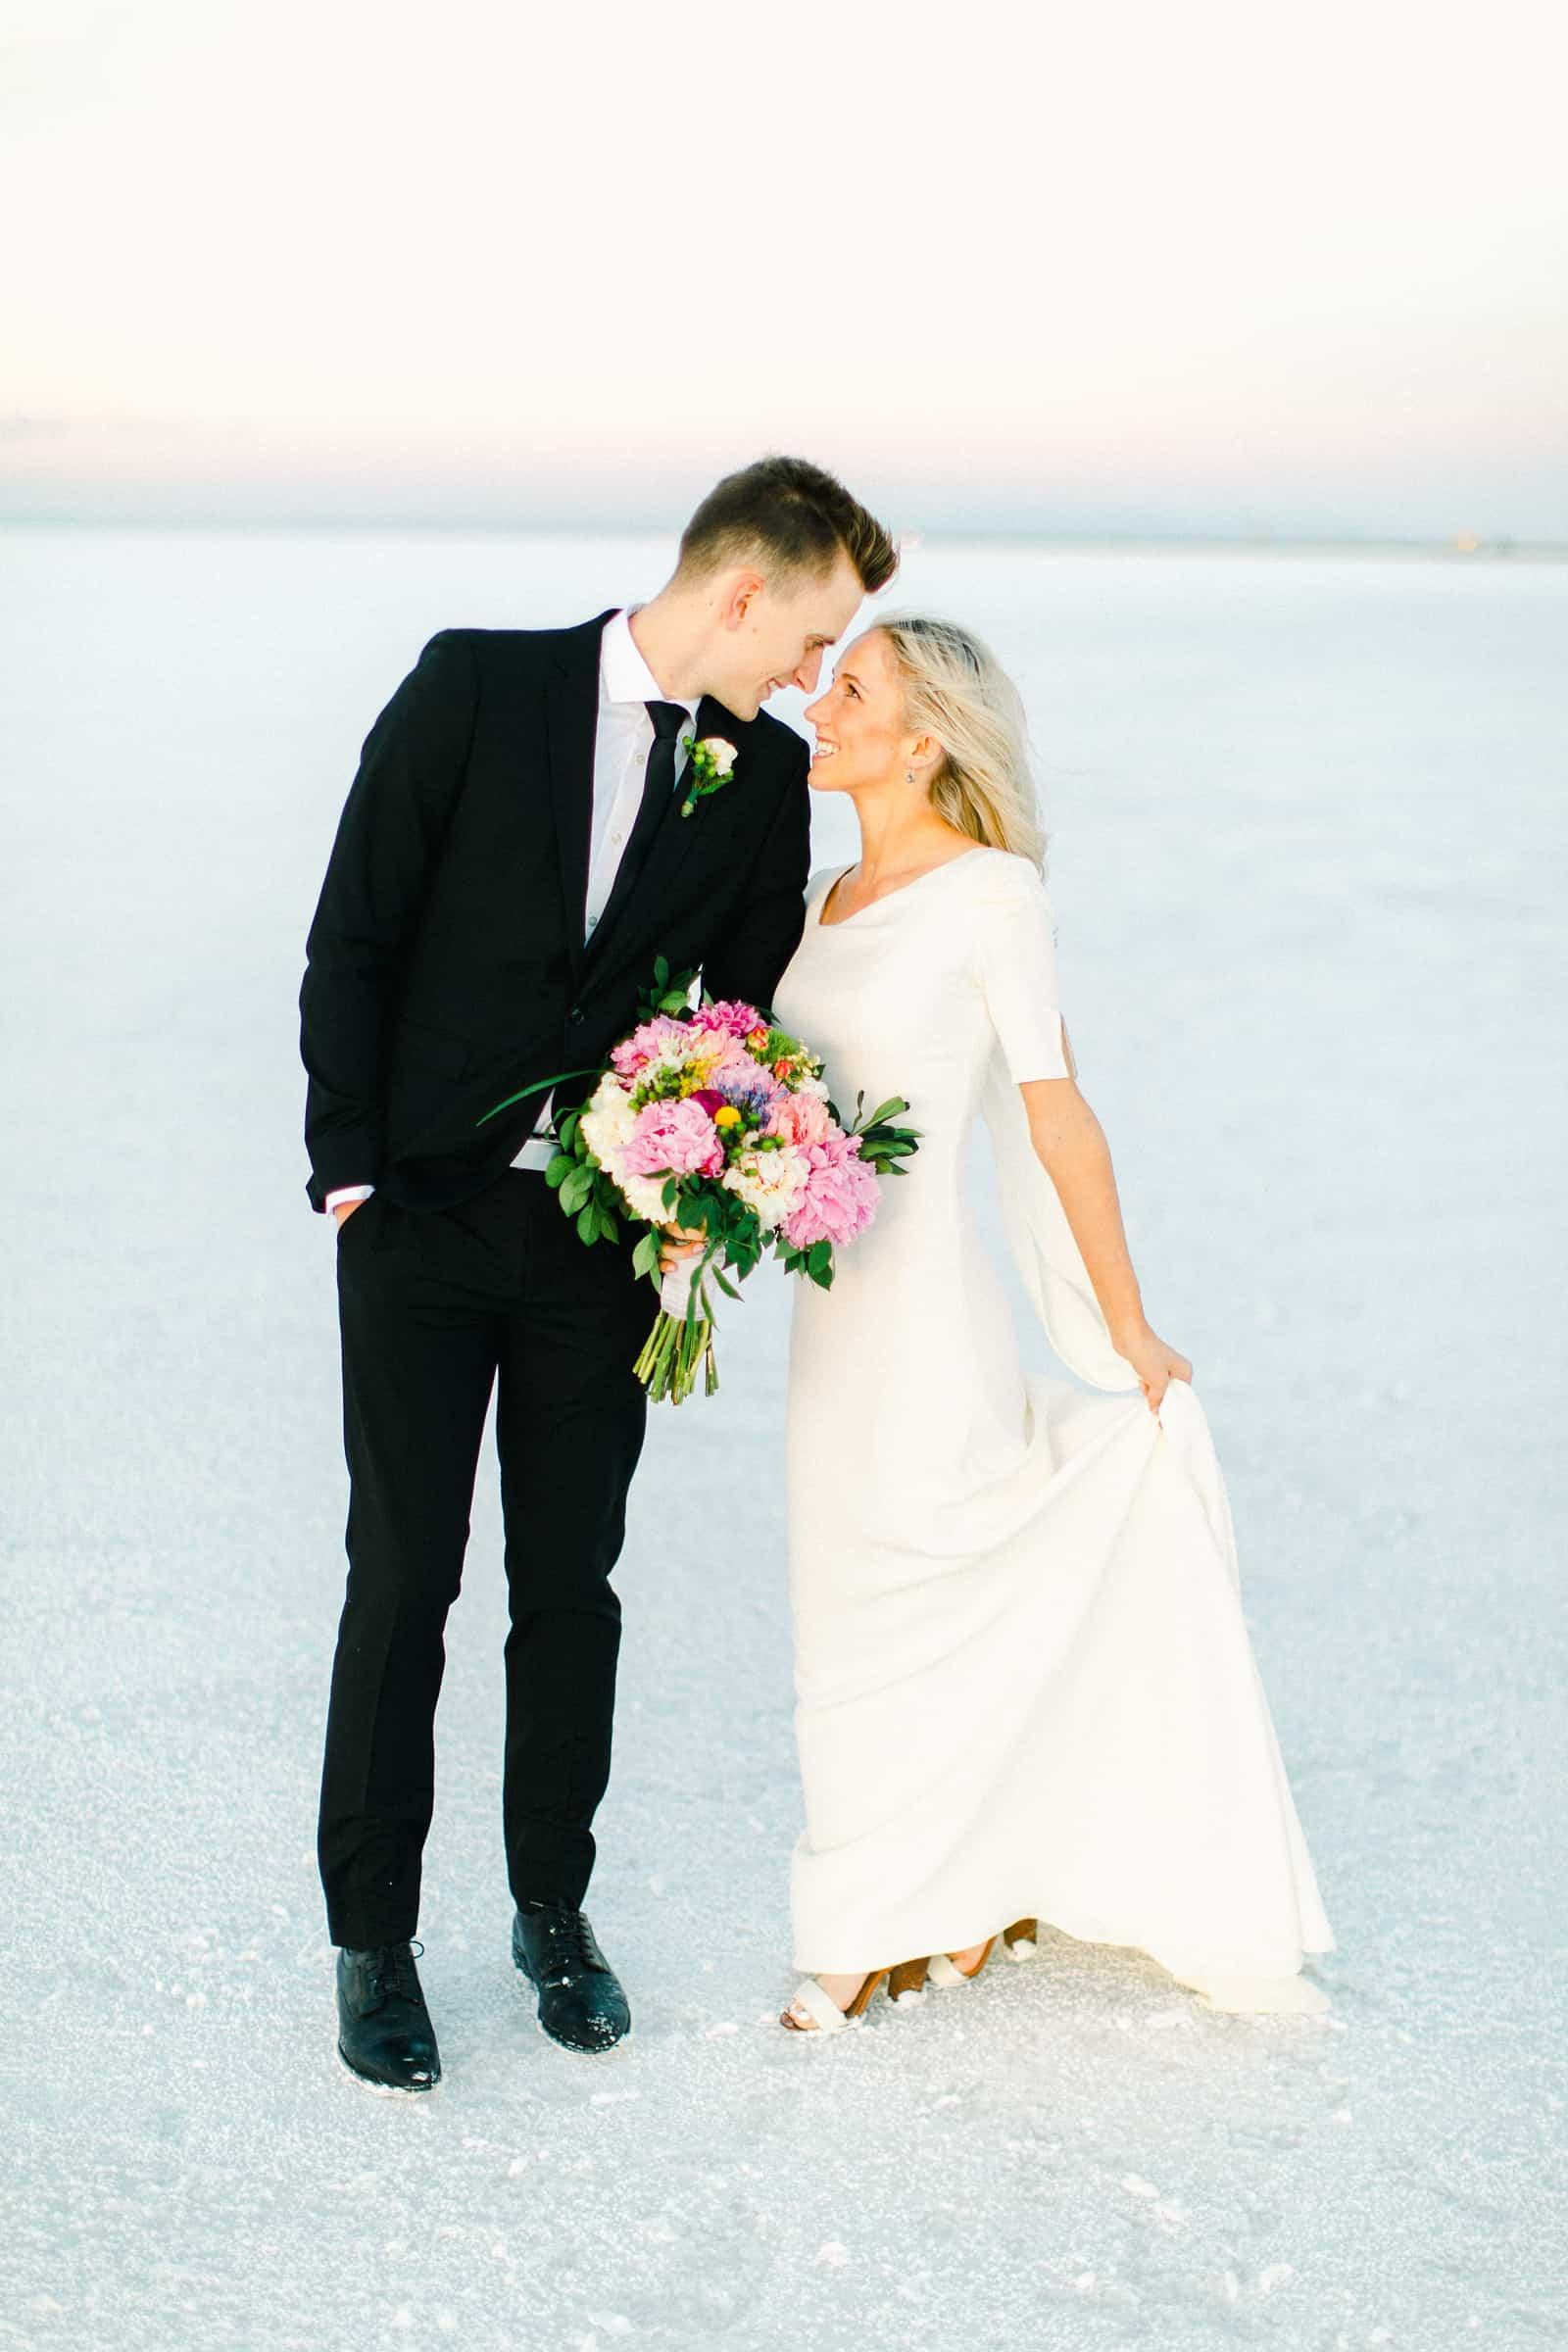 Bonneville Salt Flats Utah Wedding Photography, destination wedding, light and airy film photography bride and groom